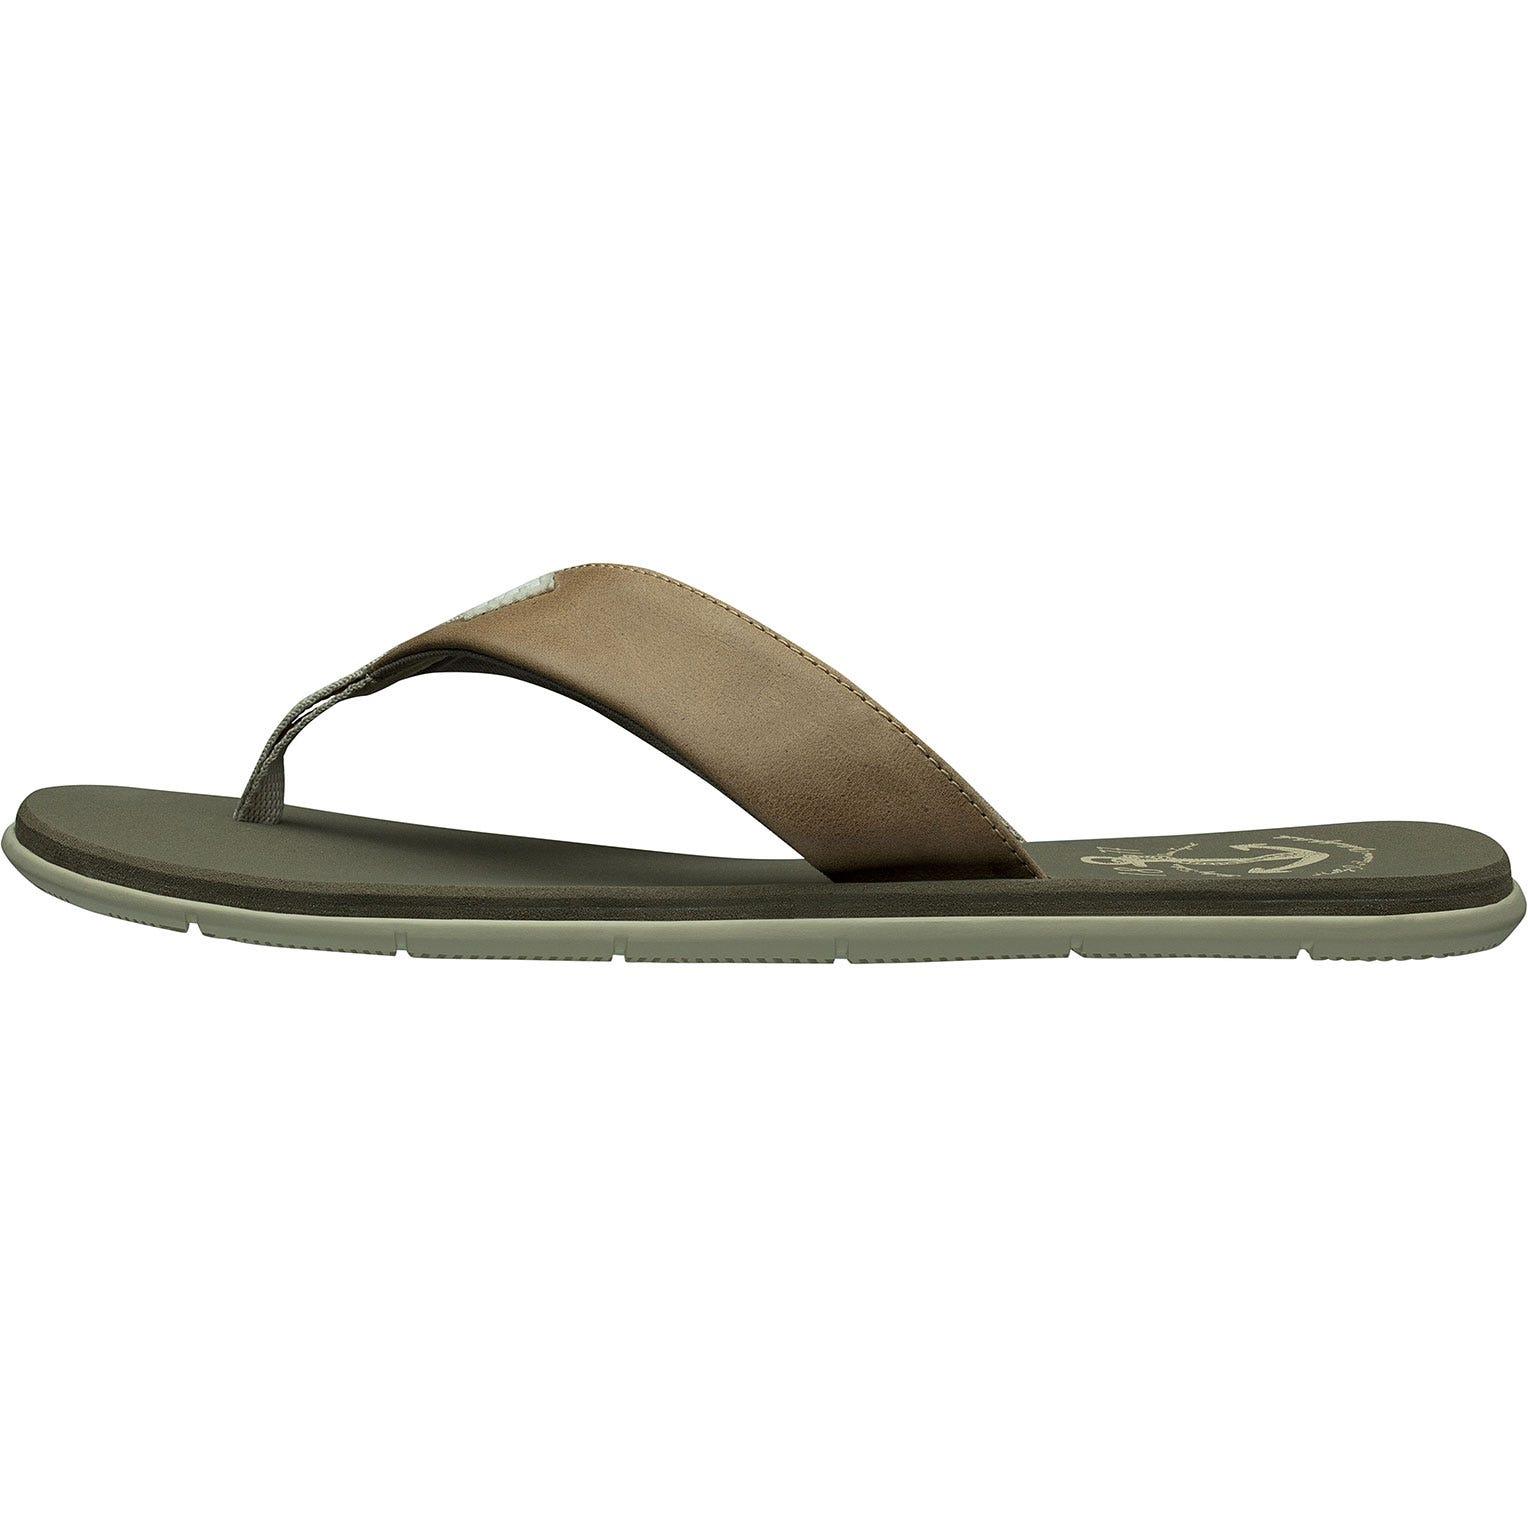 Helly Hansen Seasand Leather Sandal Mens Beige 48/13